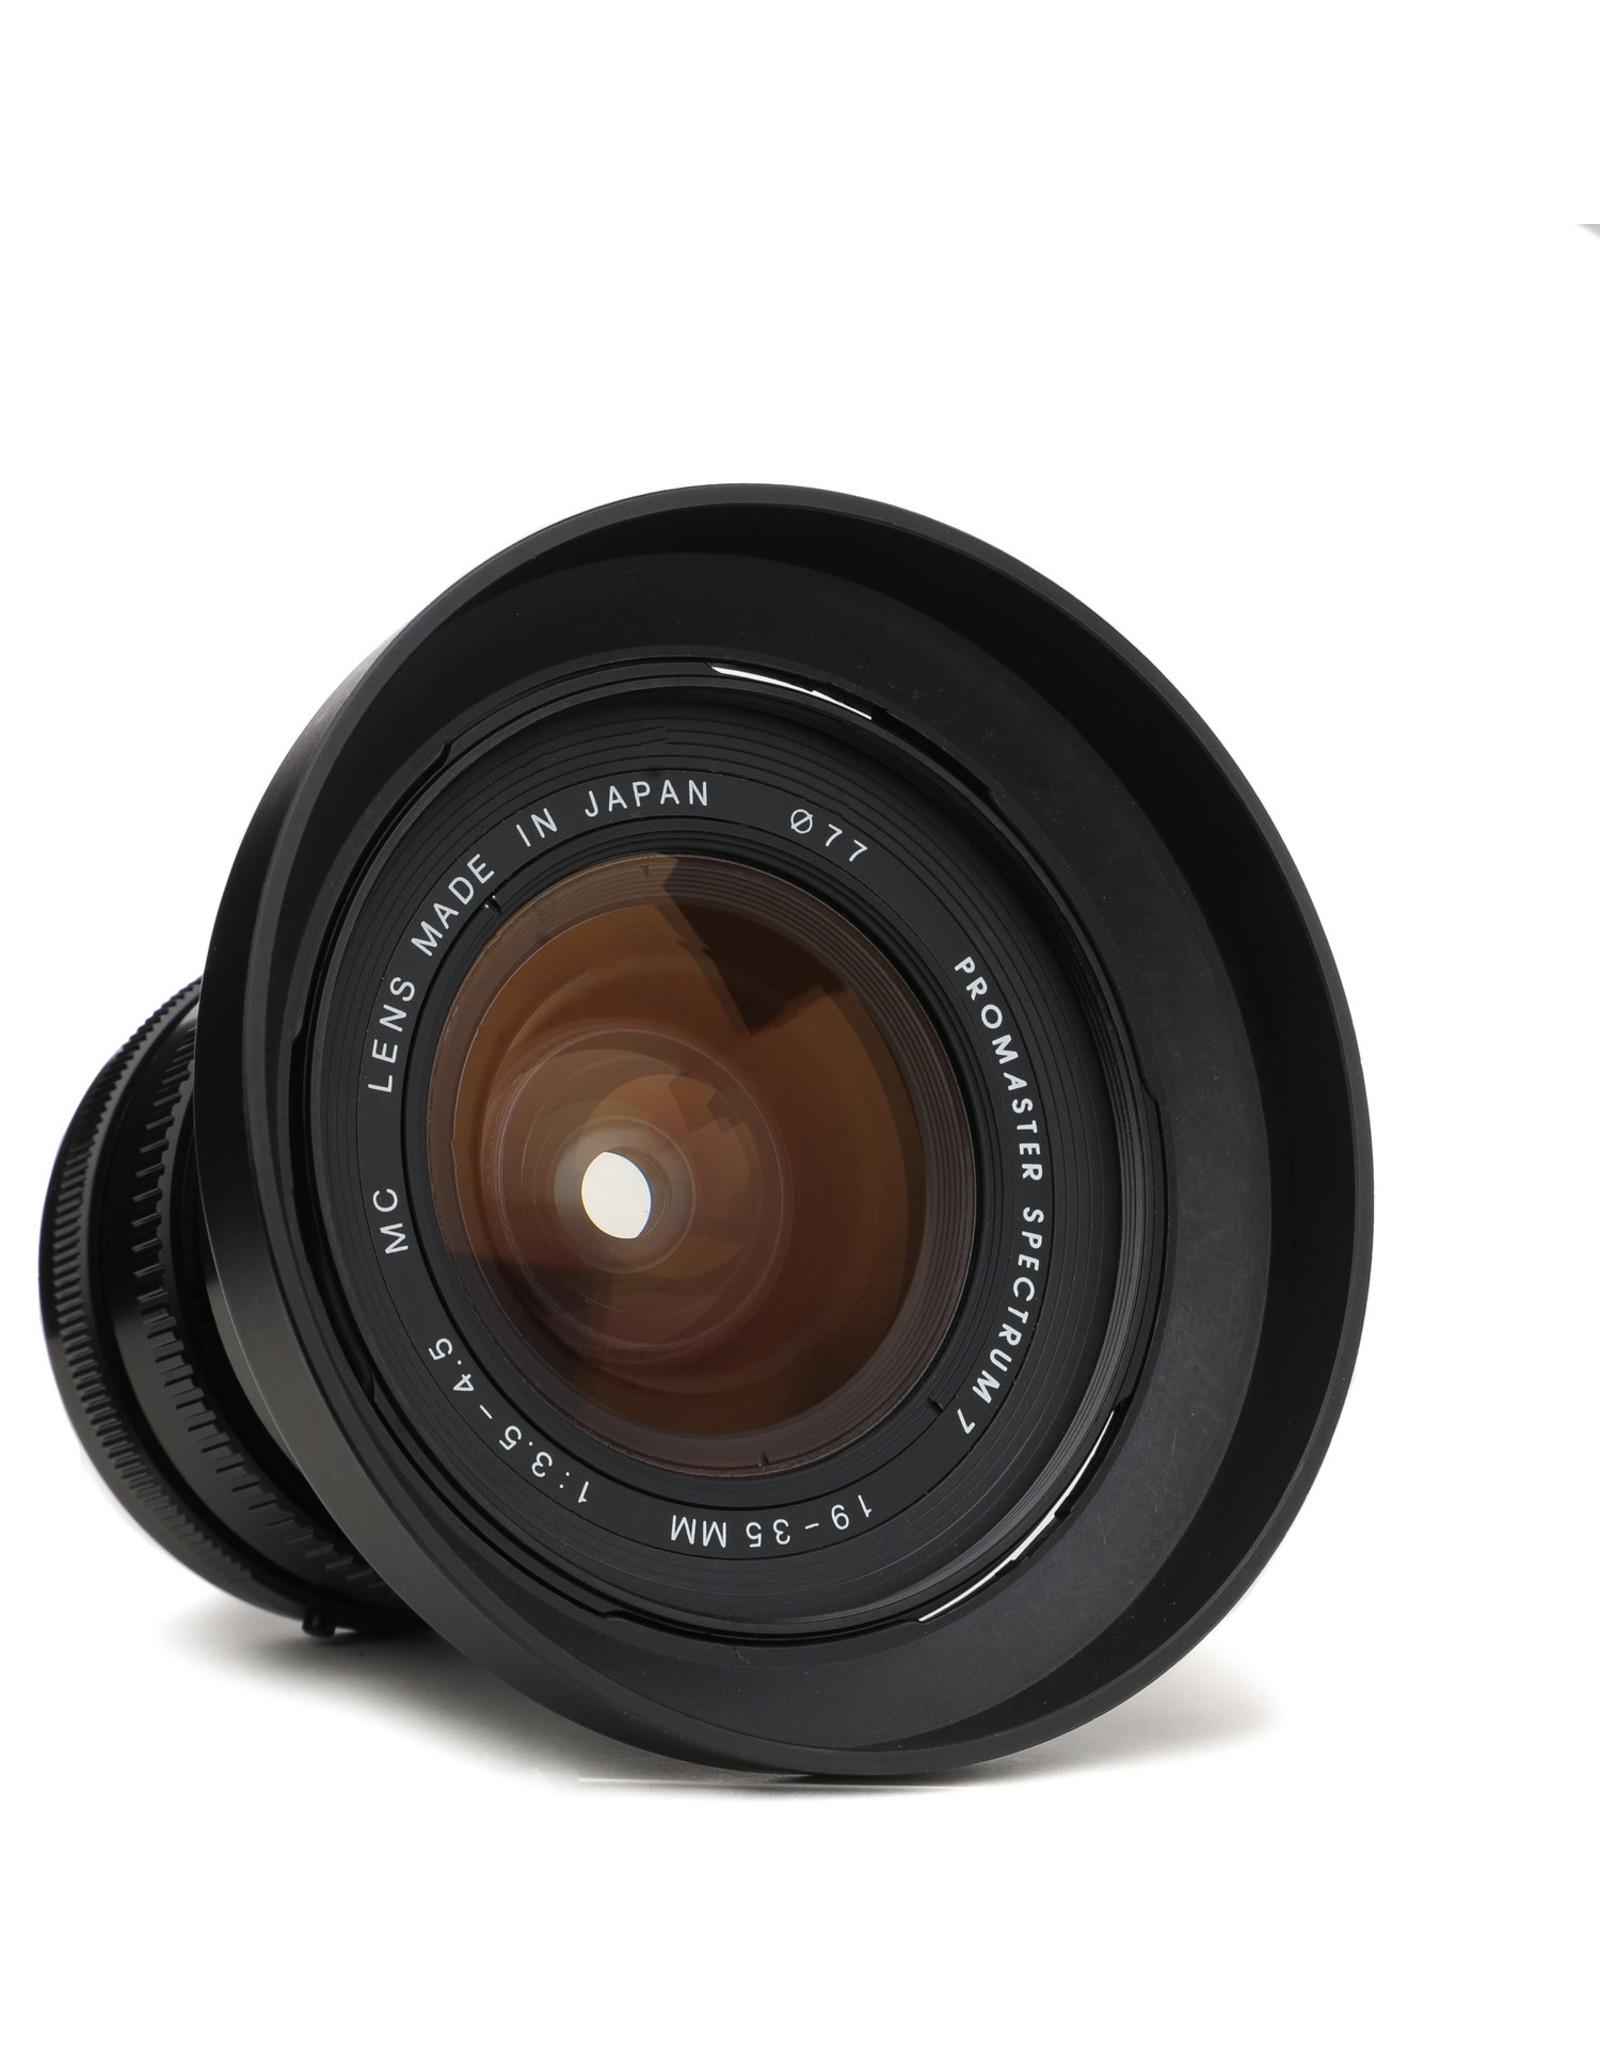 Promaster Promaster Spectrum 19-35mm f/3.5-4.5 Lens for K Mount